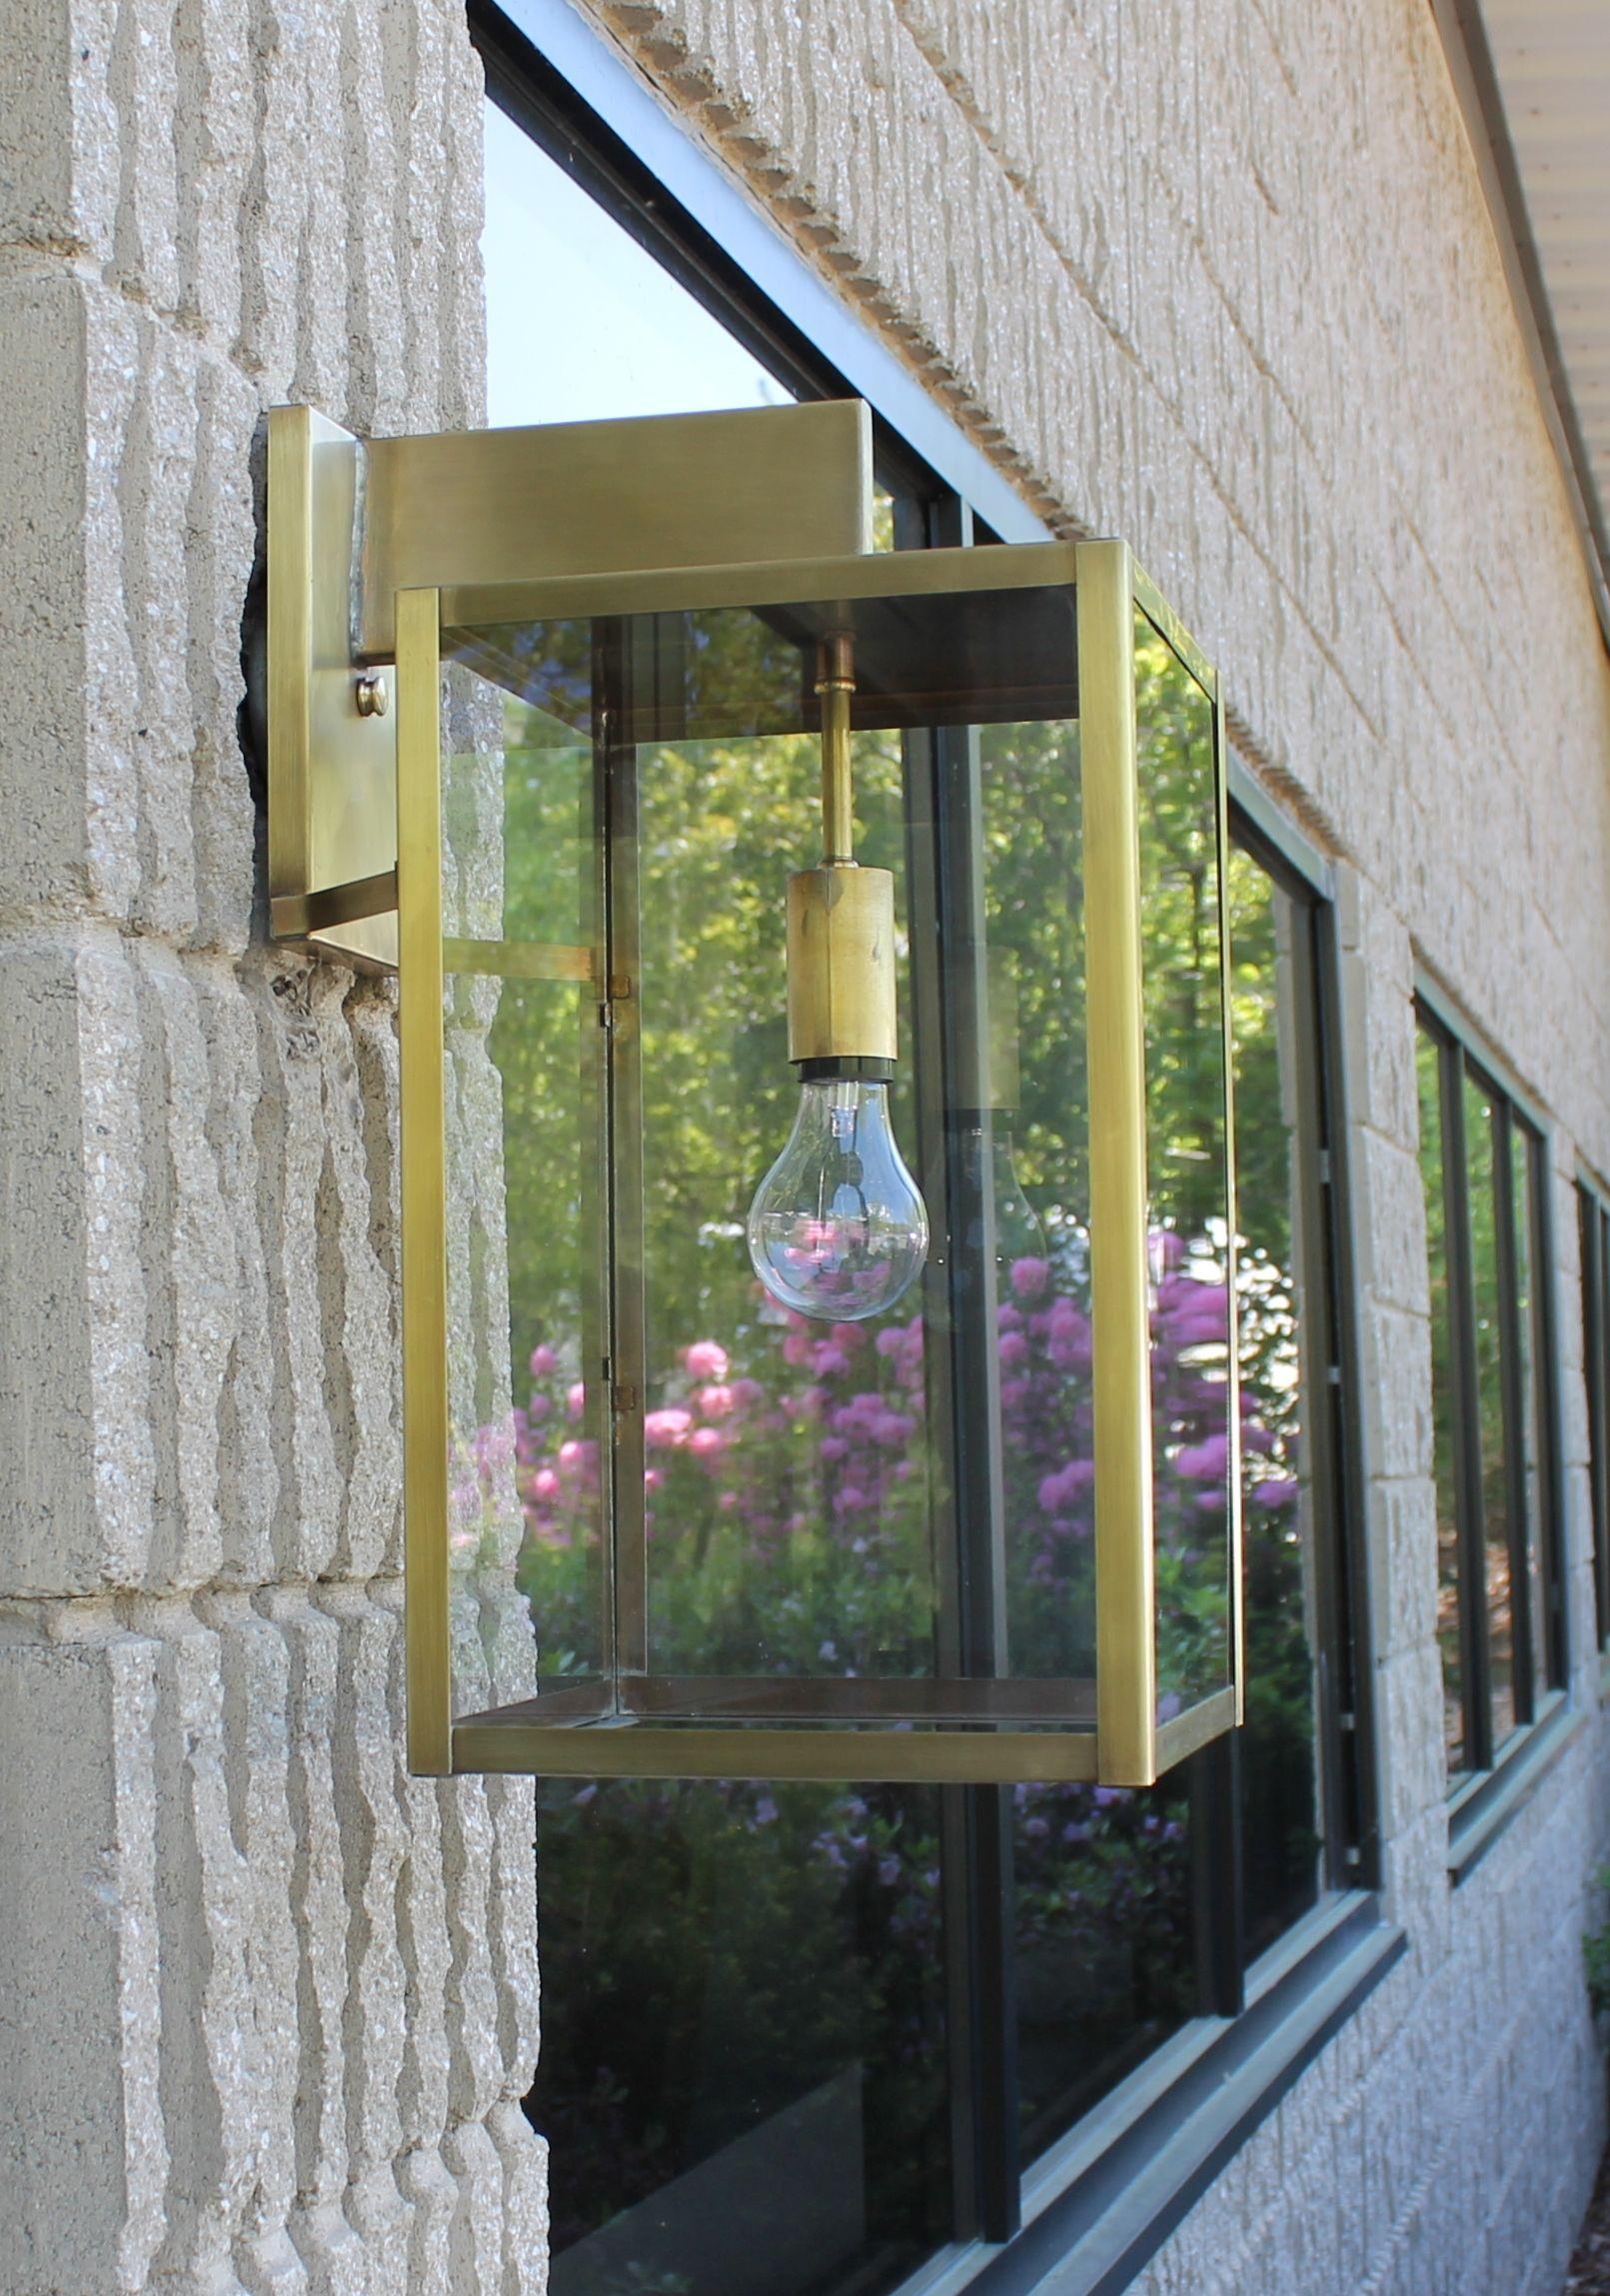 Escamilla 1 Light Outdoor Wall Lantern In 2020 Exterior Wall Light Outdoor Wall Lantern Wall Lights